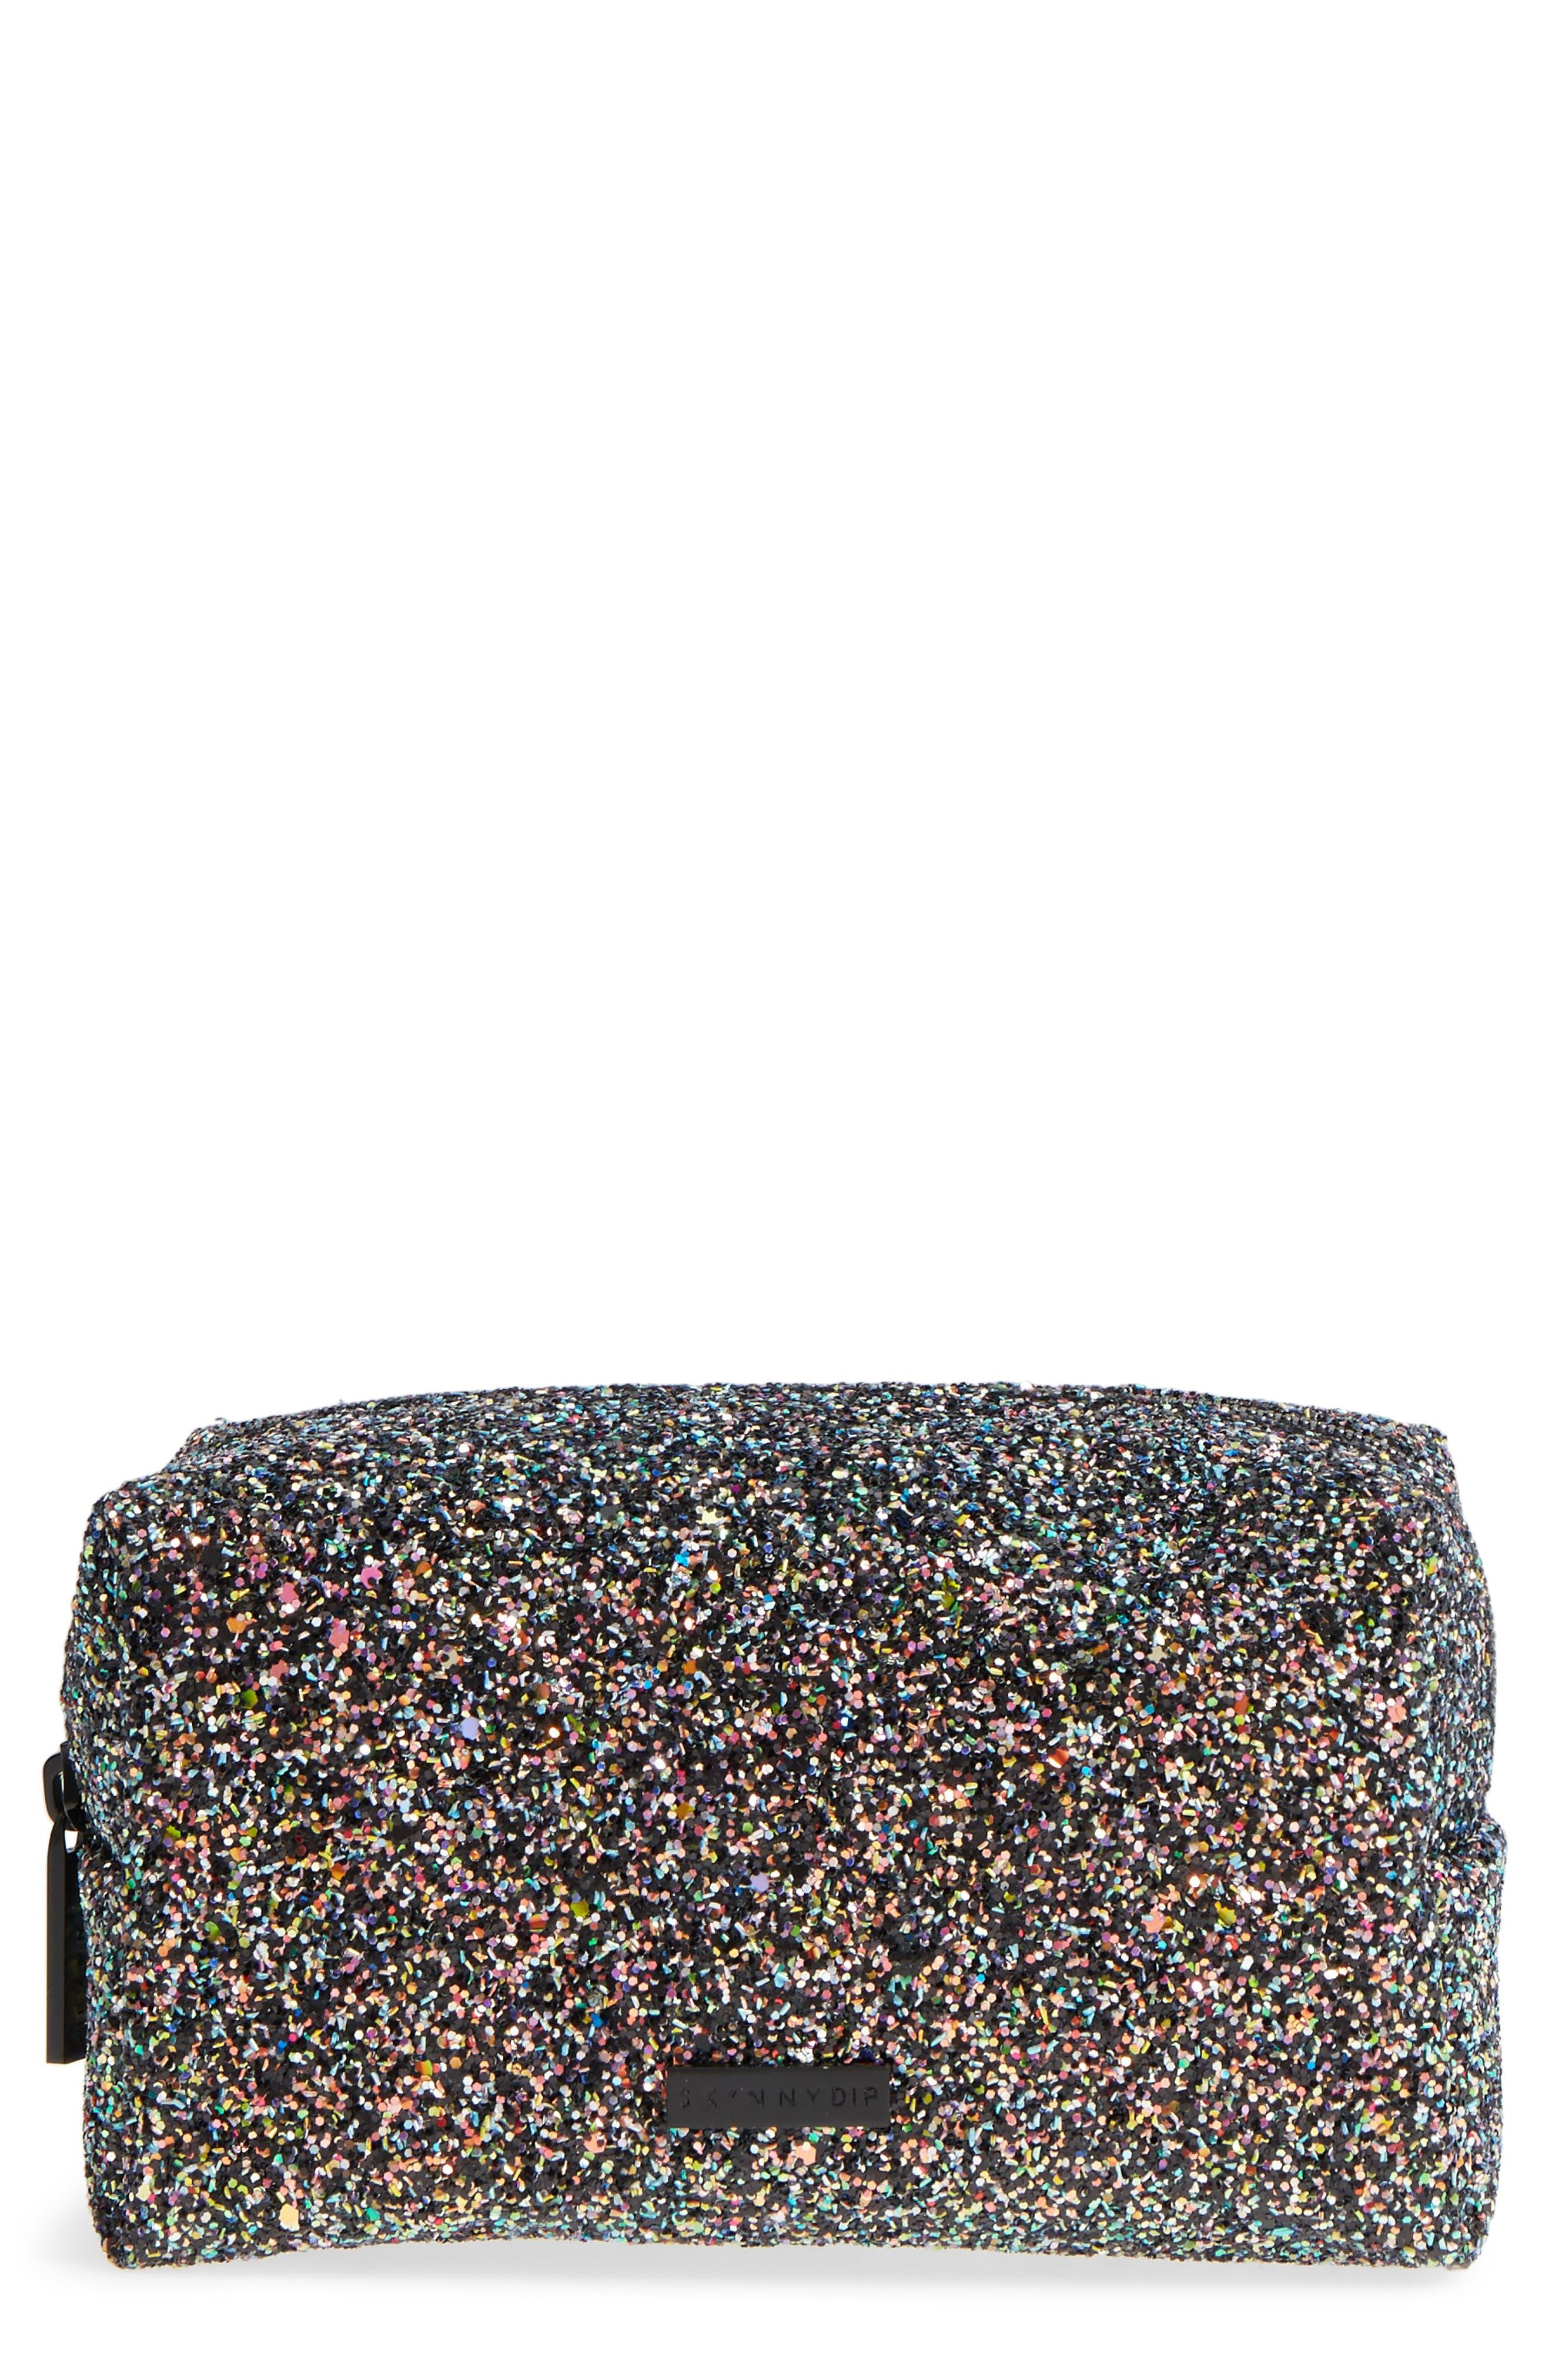 Skinny Dip Liquorice Glitter Cosmetics Bag,                             Main thumbnail 1, color,                             000